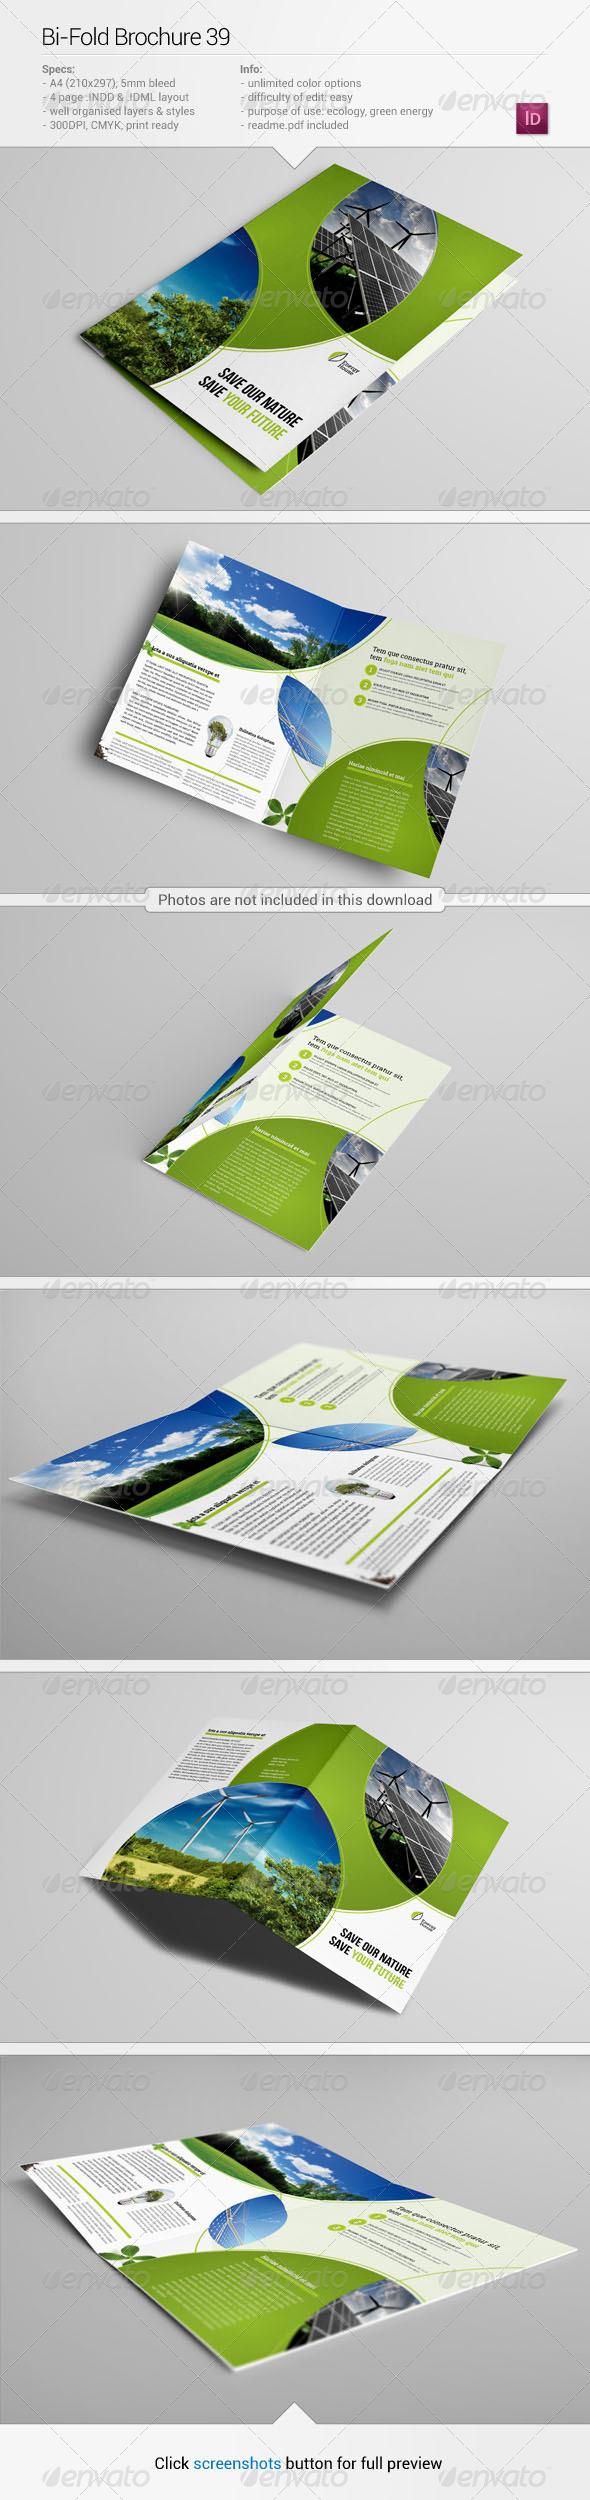 Bi-Fold Brochure 39 - Informational Brochures